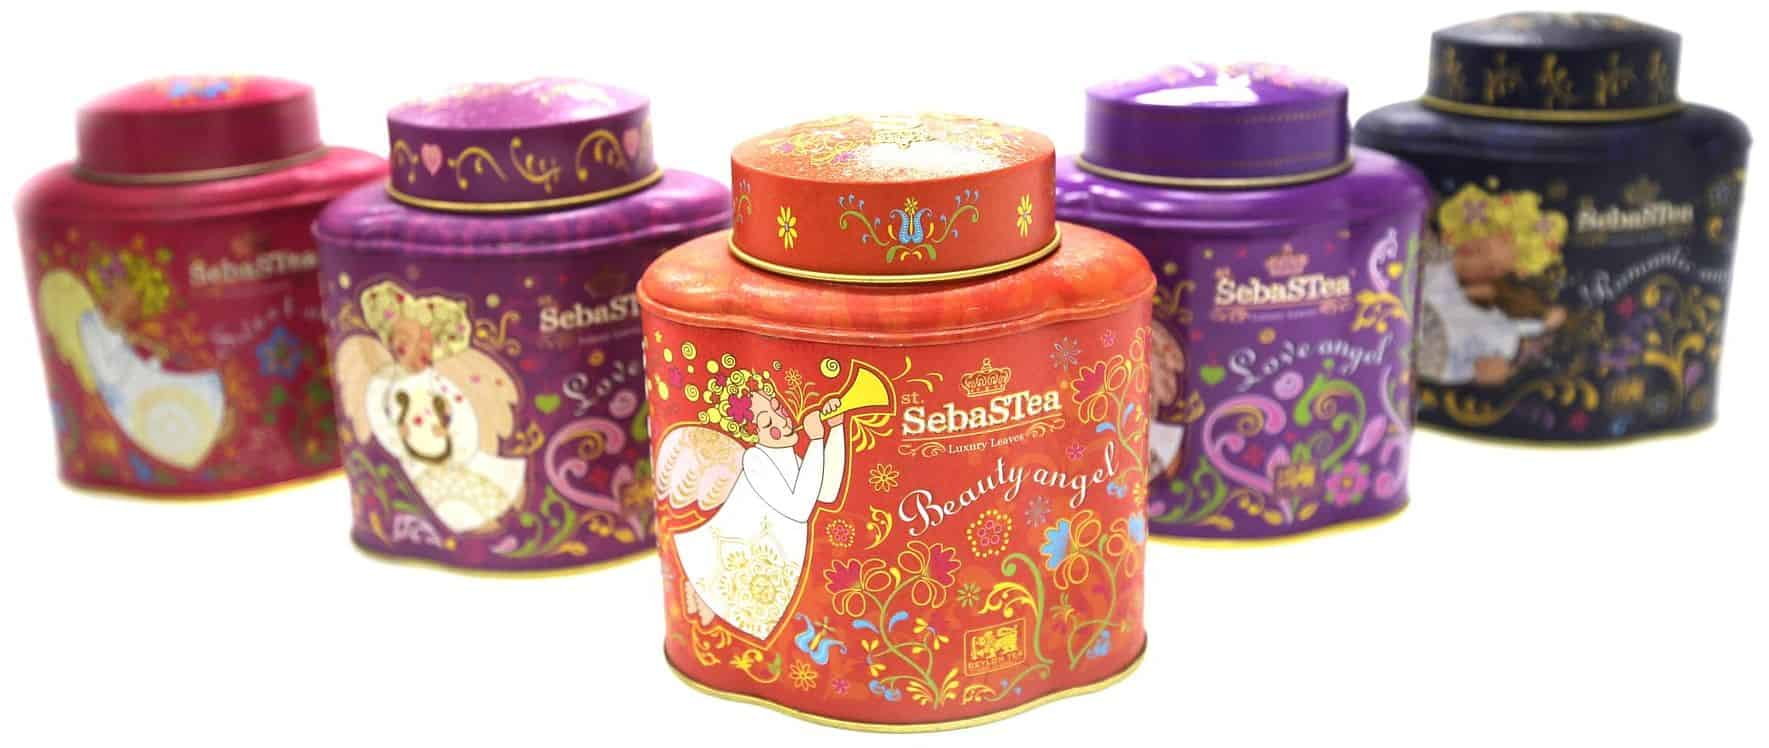 Decorative tea storage containers